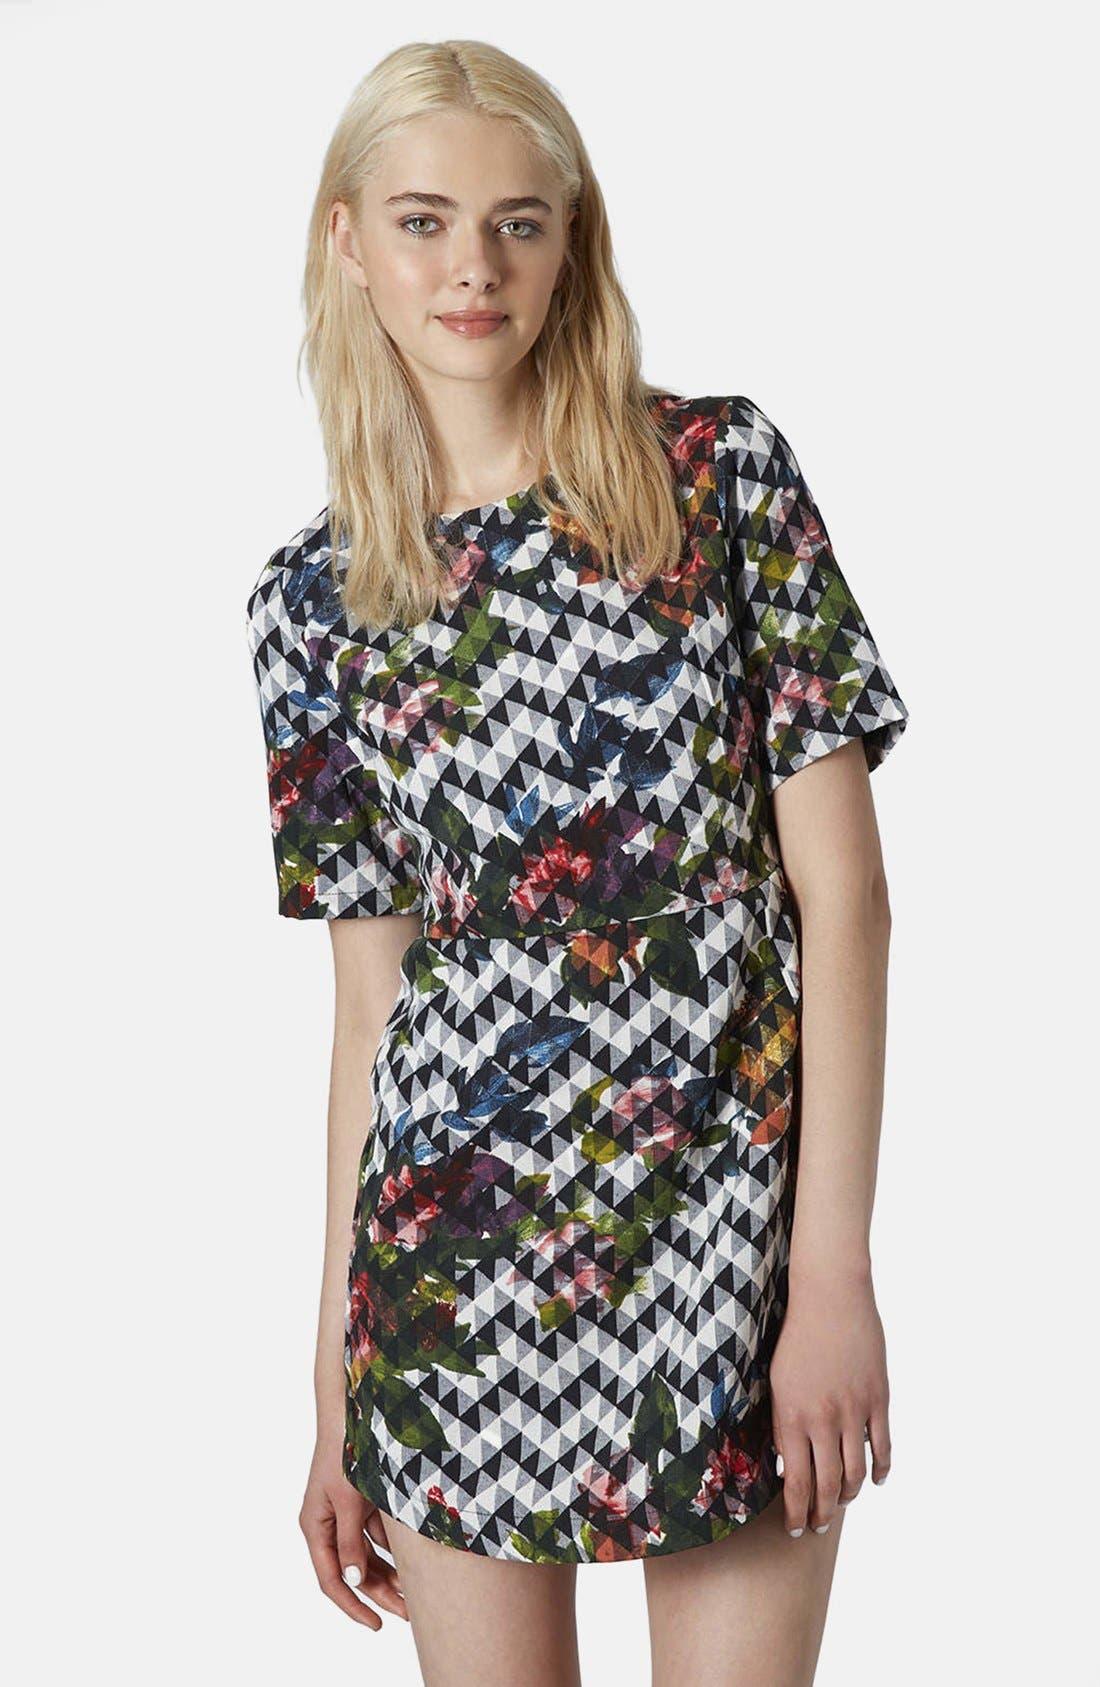 Alternate Image 1 Selected - Topshop Blurred Jacquard A-Line Dress